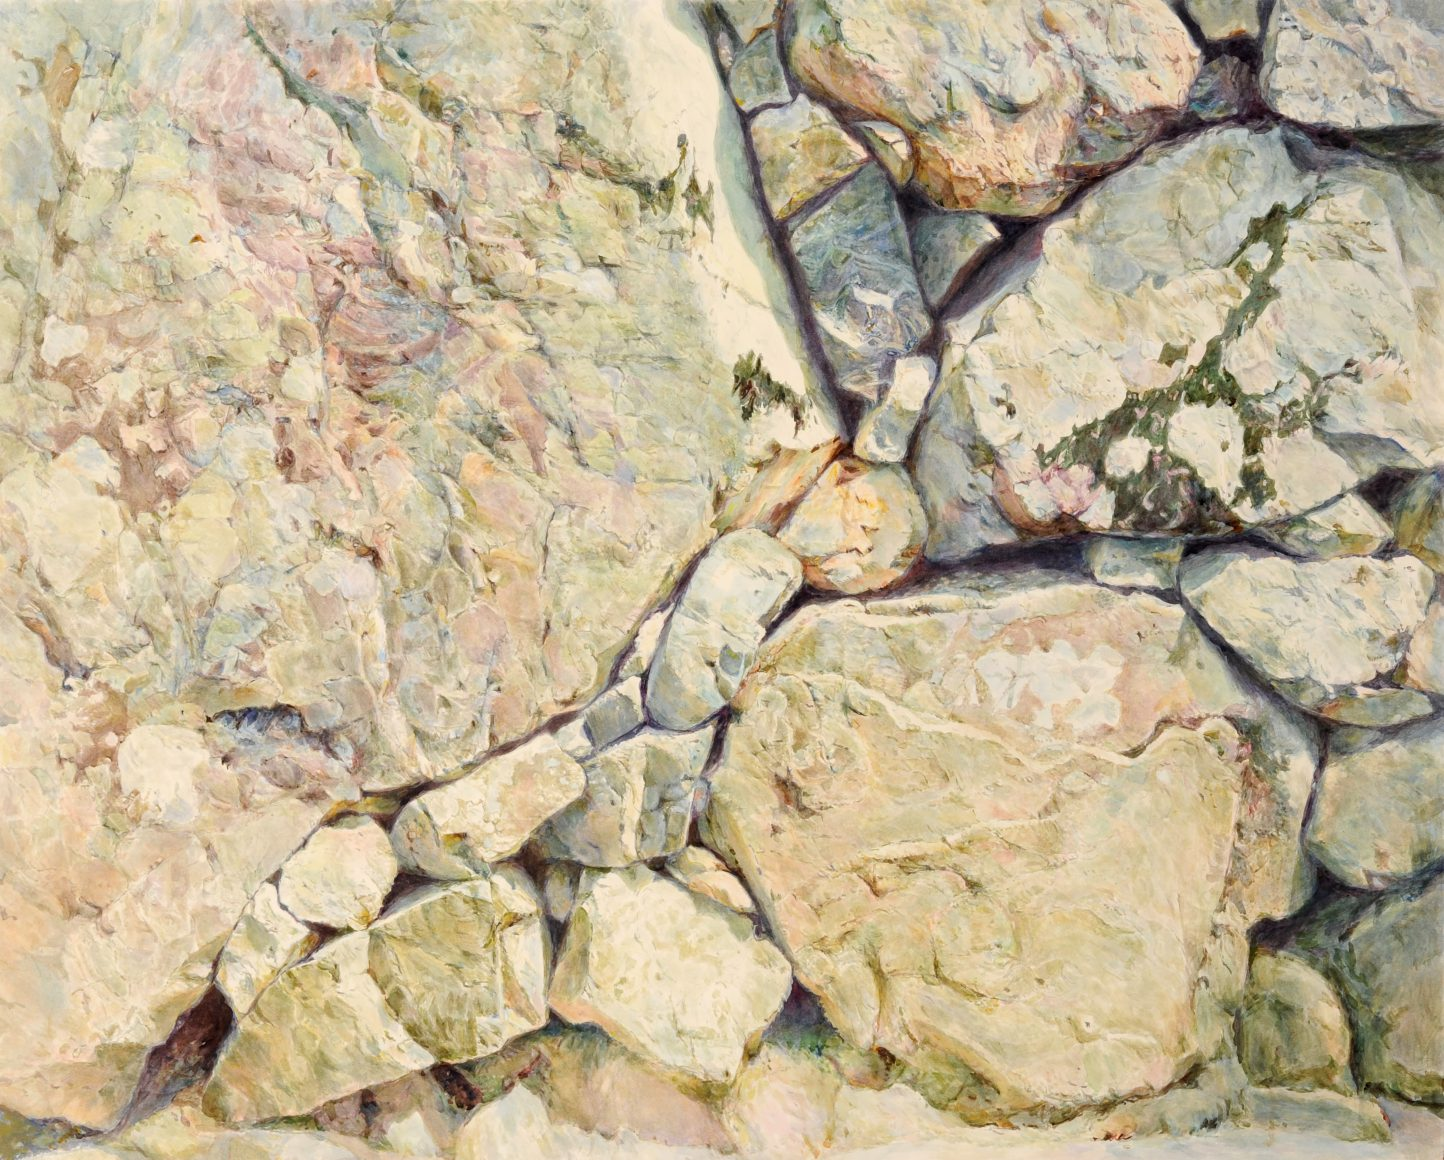 第70回滋賀県美術展覧会(平面の部)特選「バランス」